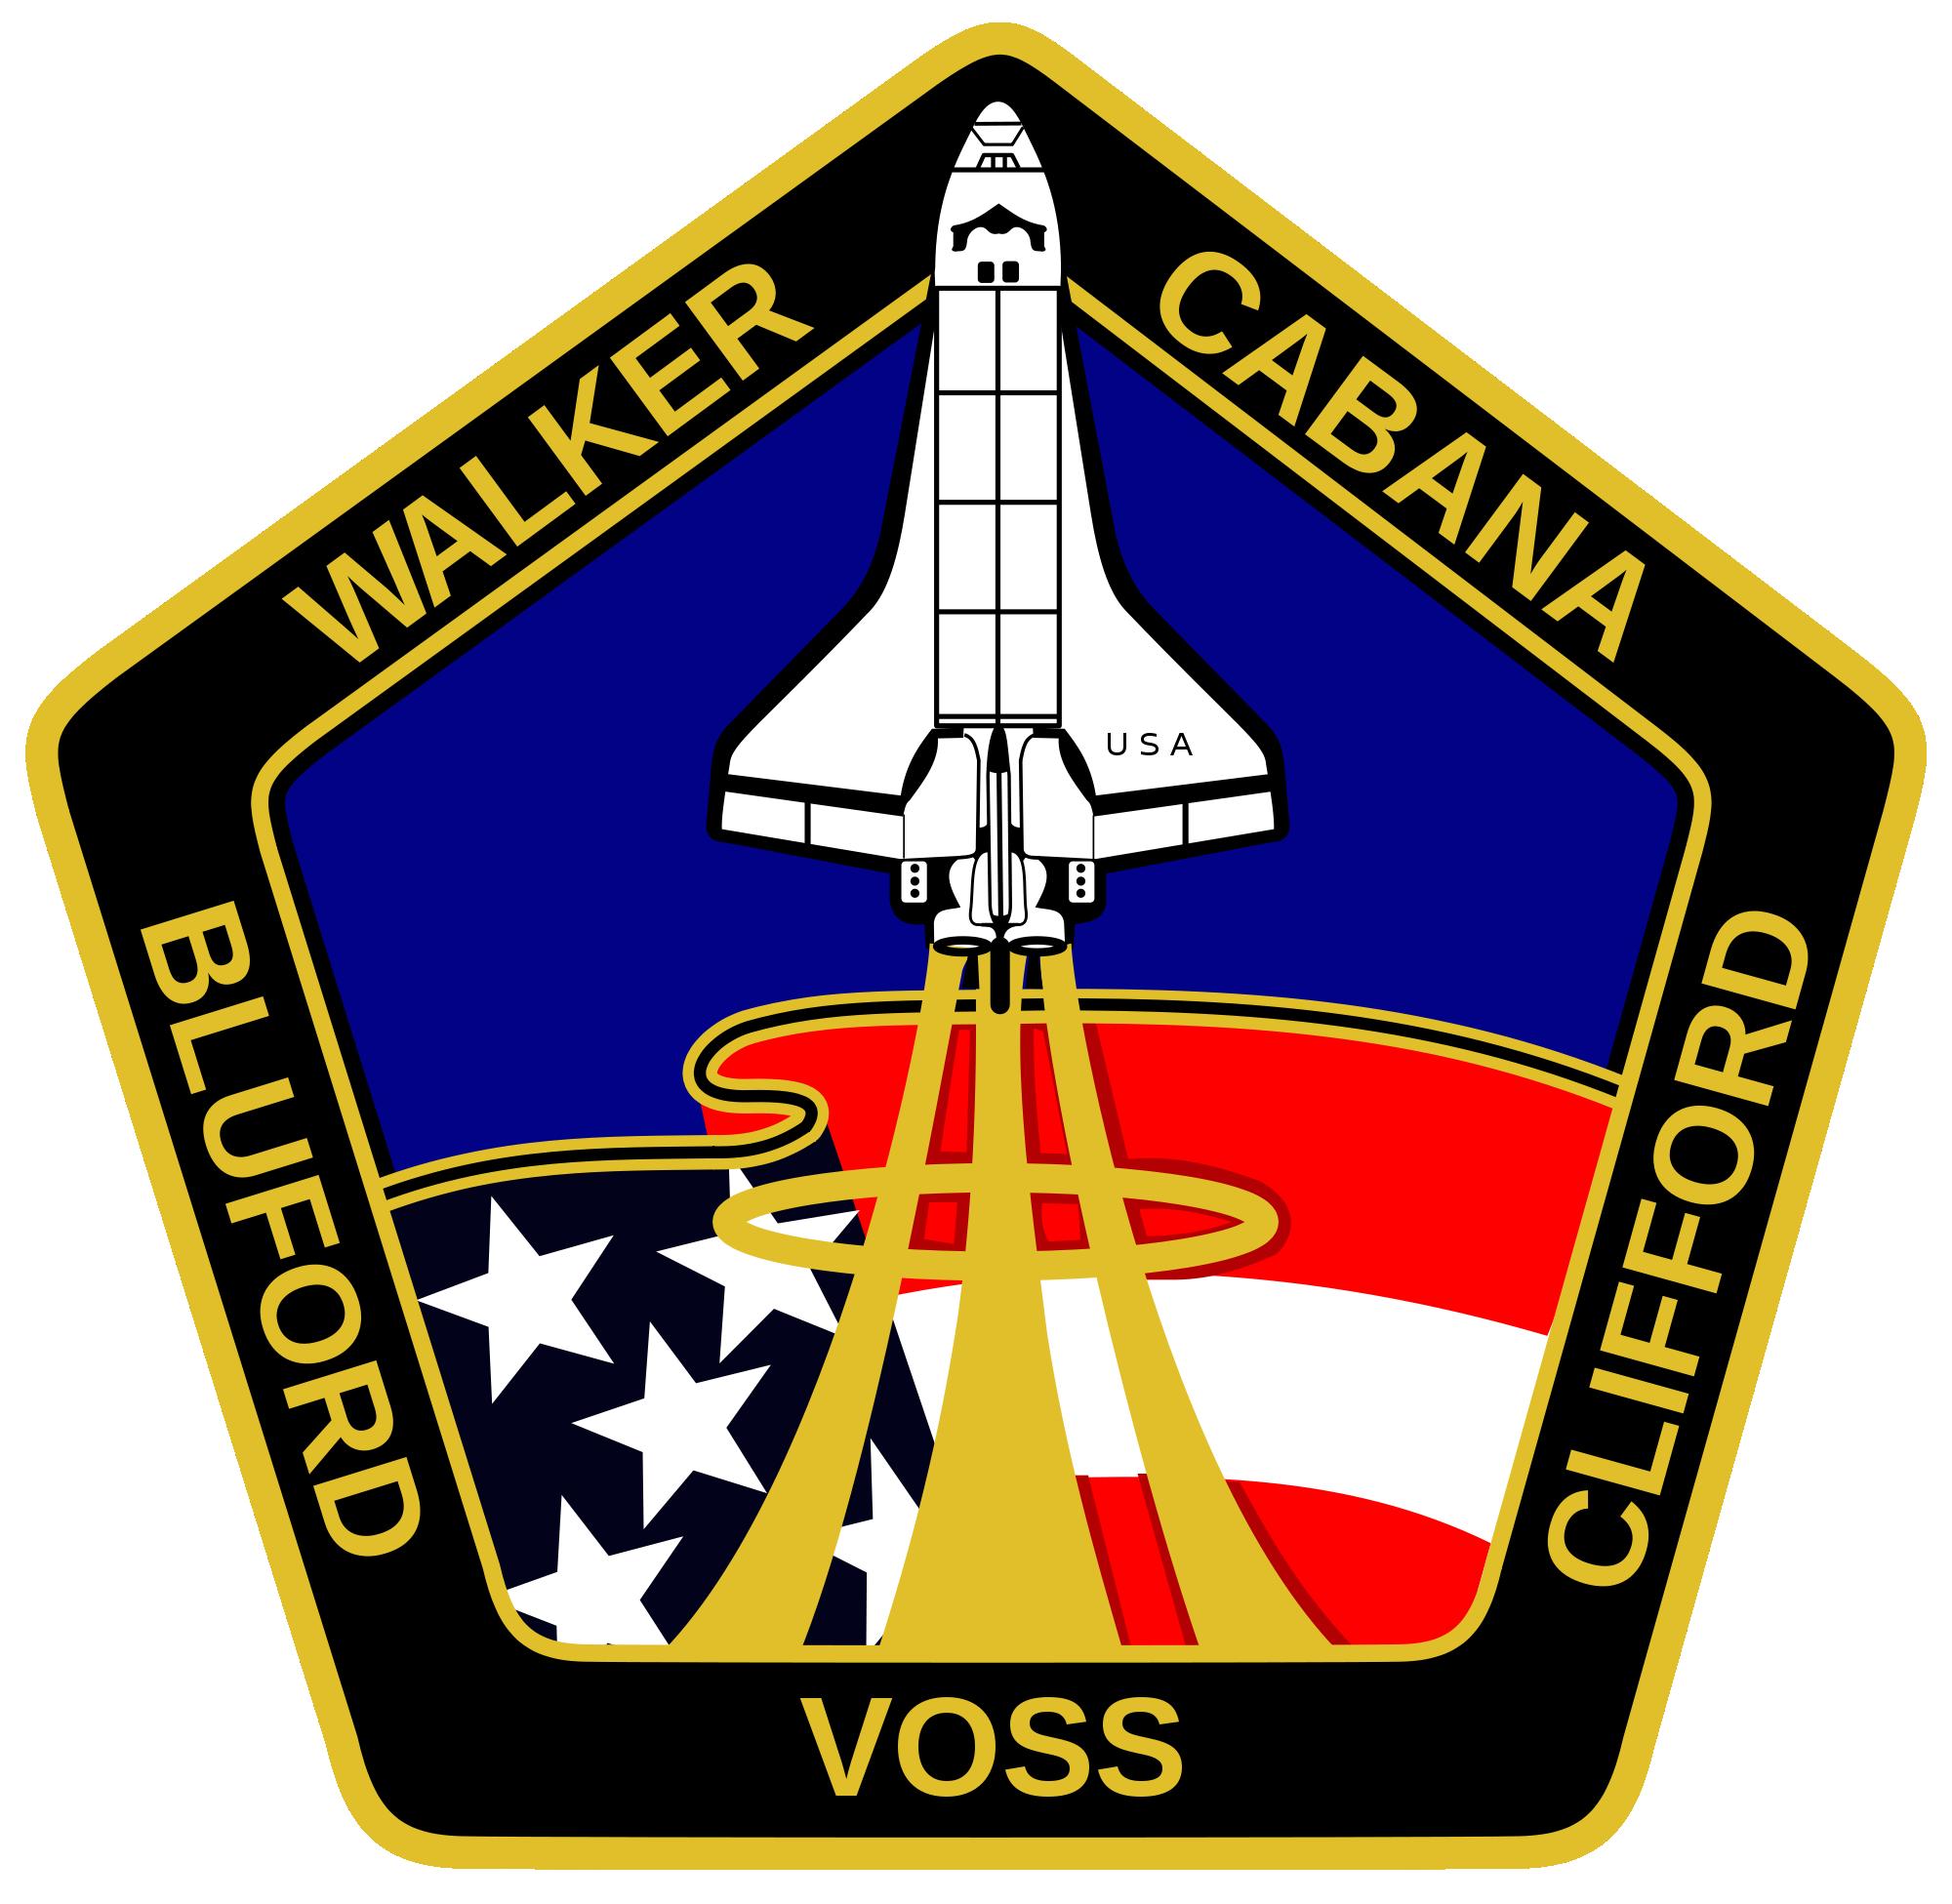 STS53.jpg (imagem JPEG, 639 × 639 pixels) Space shuttle